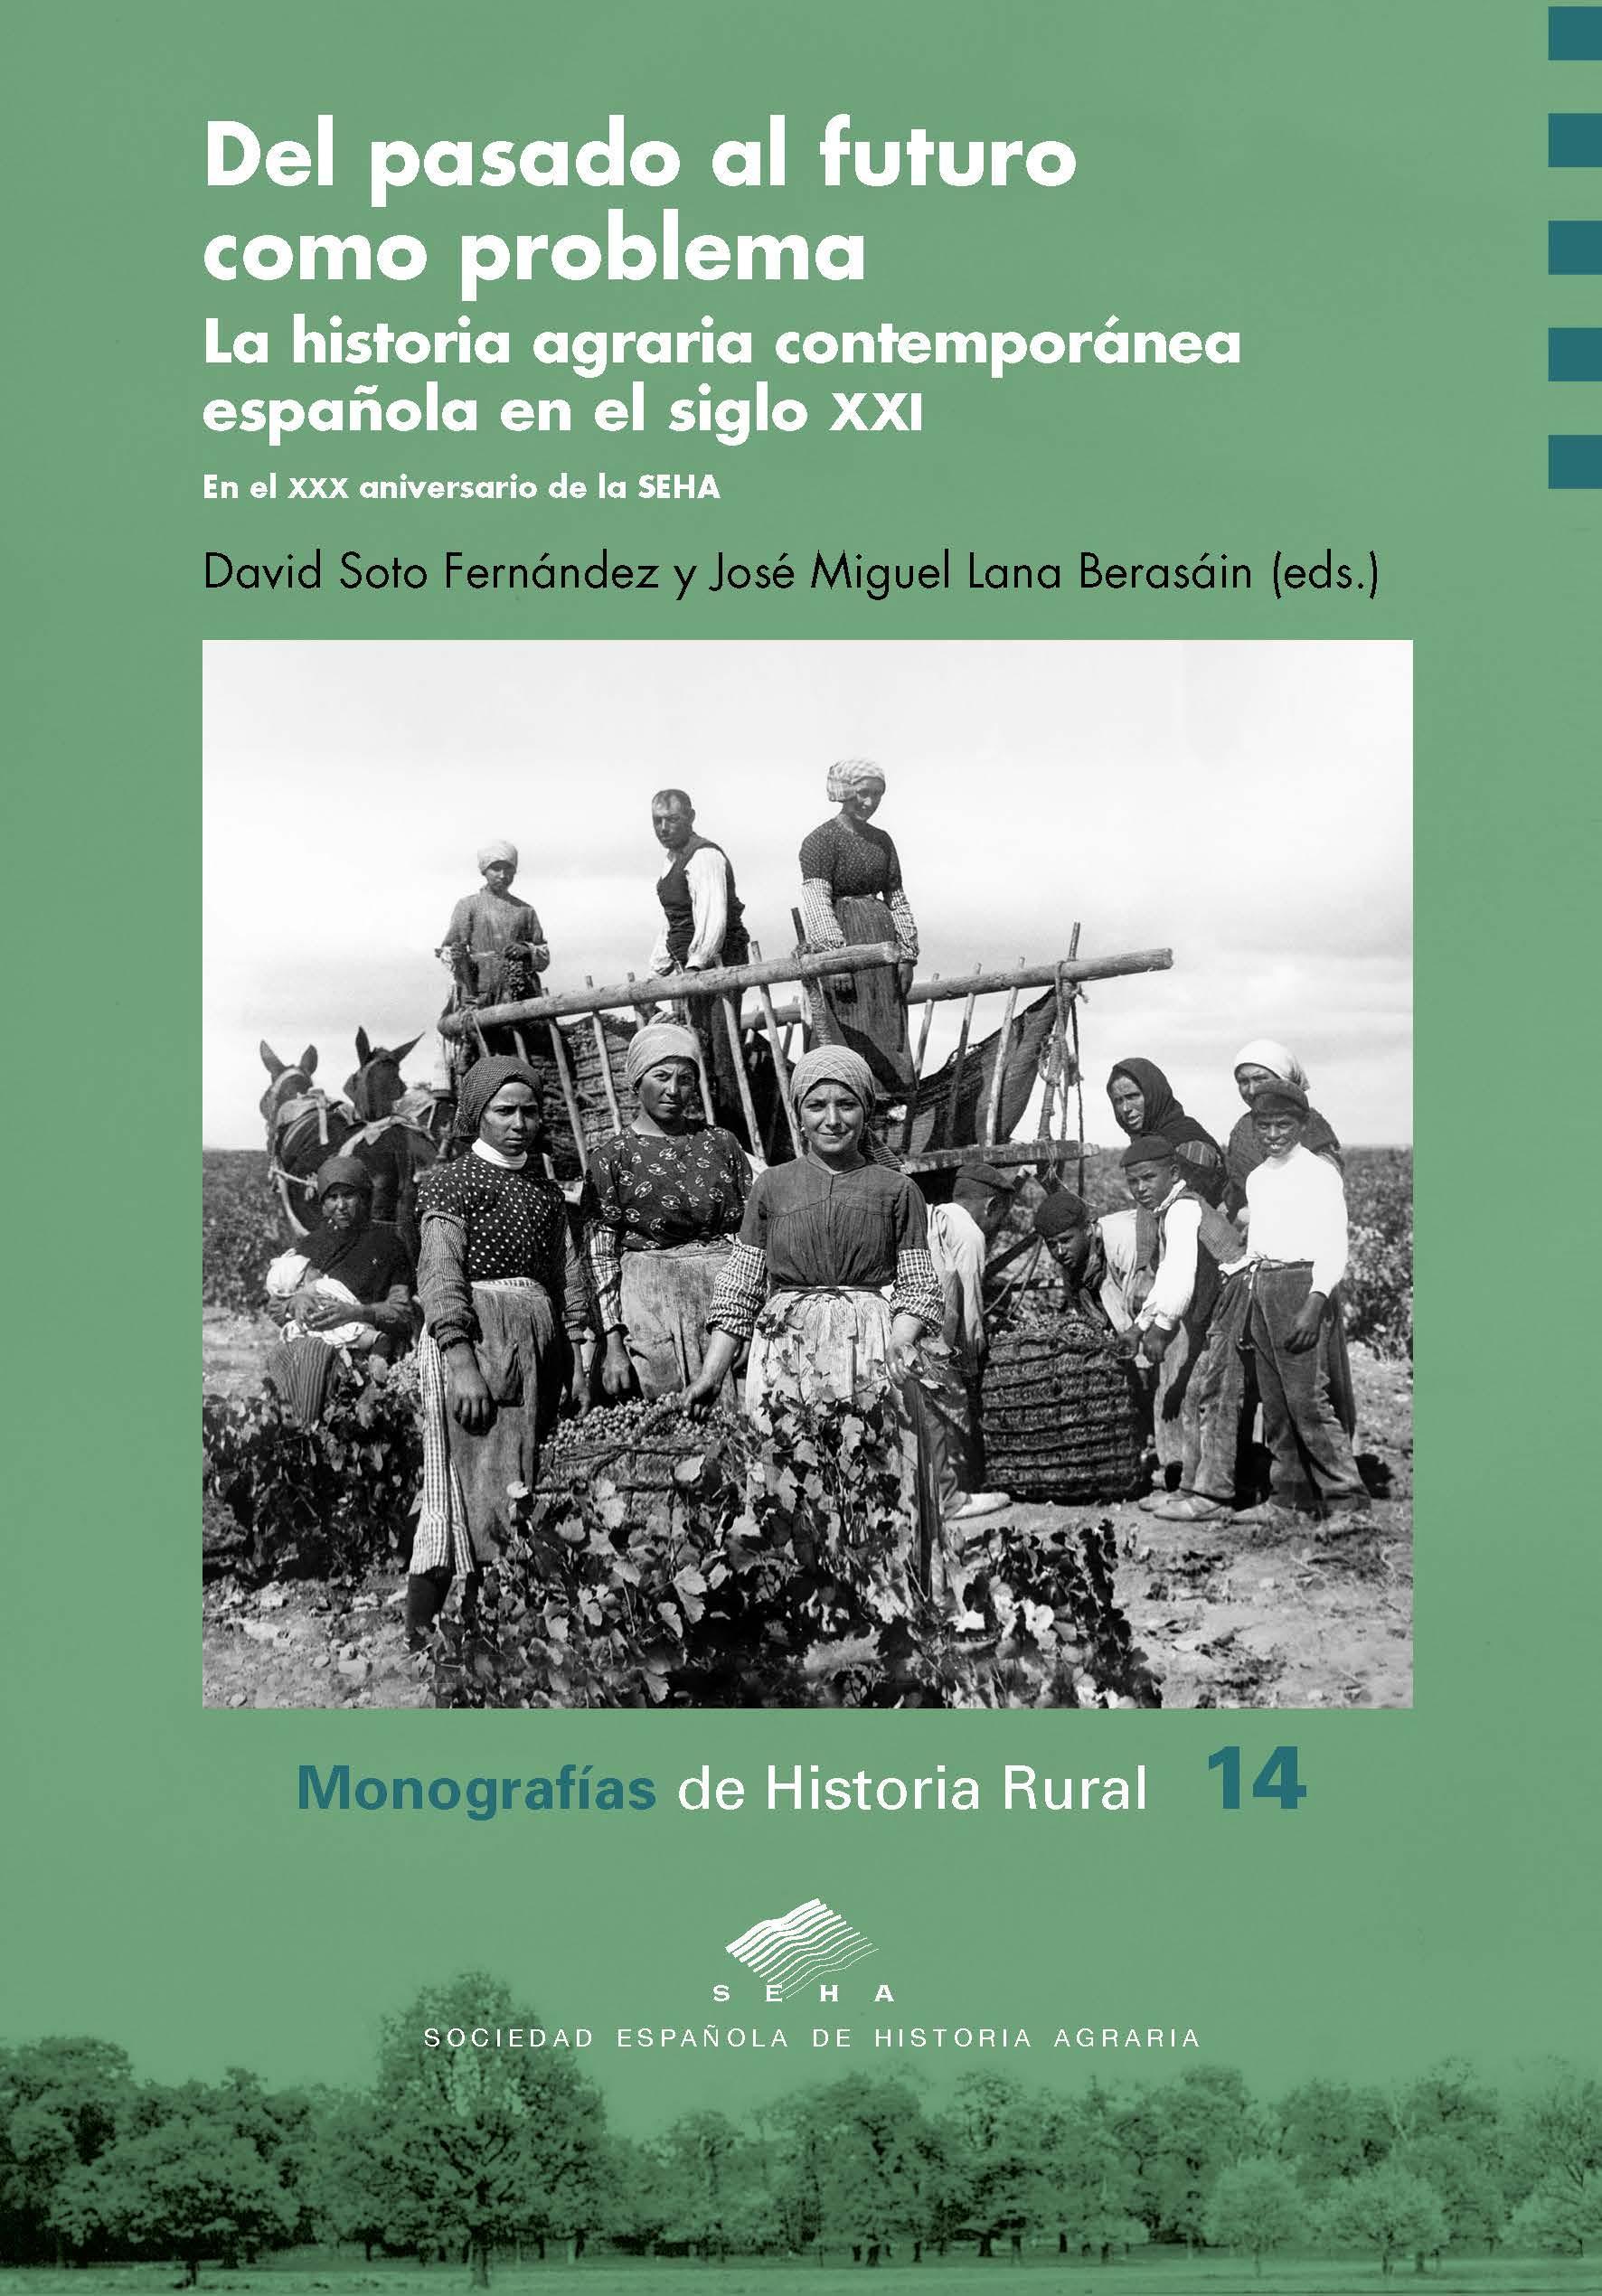 Lana Soto monografias rurales 14 digital-1_Página_001